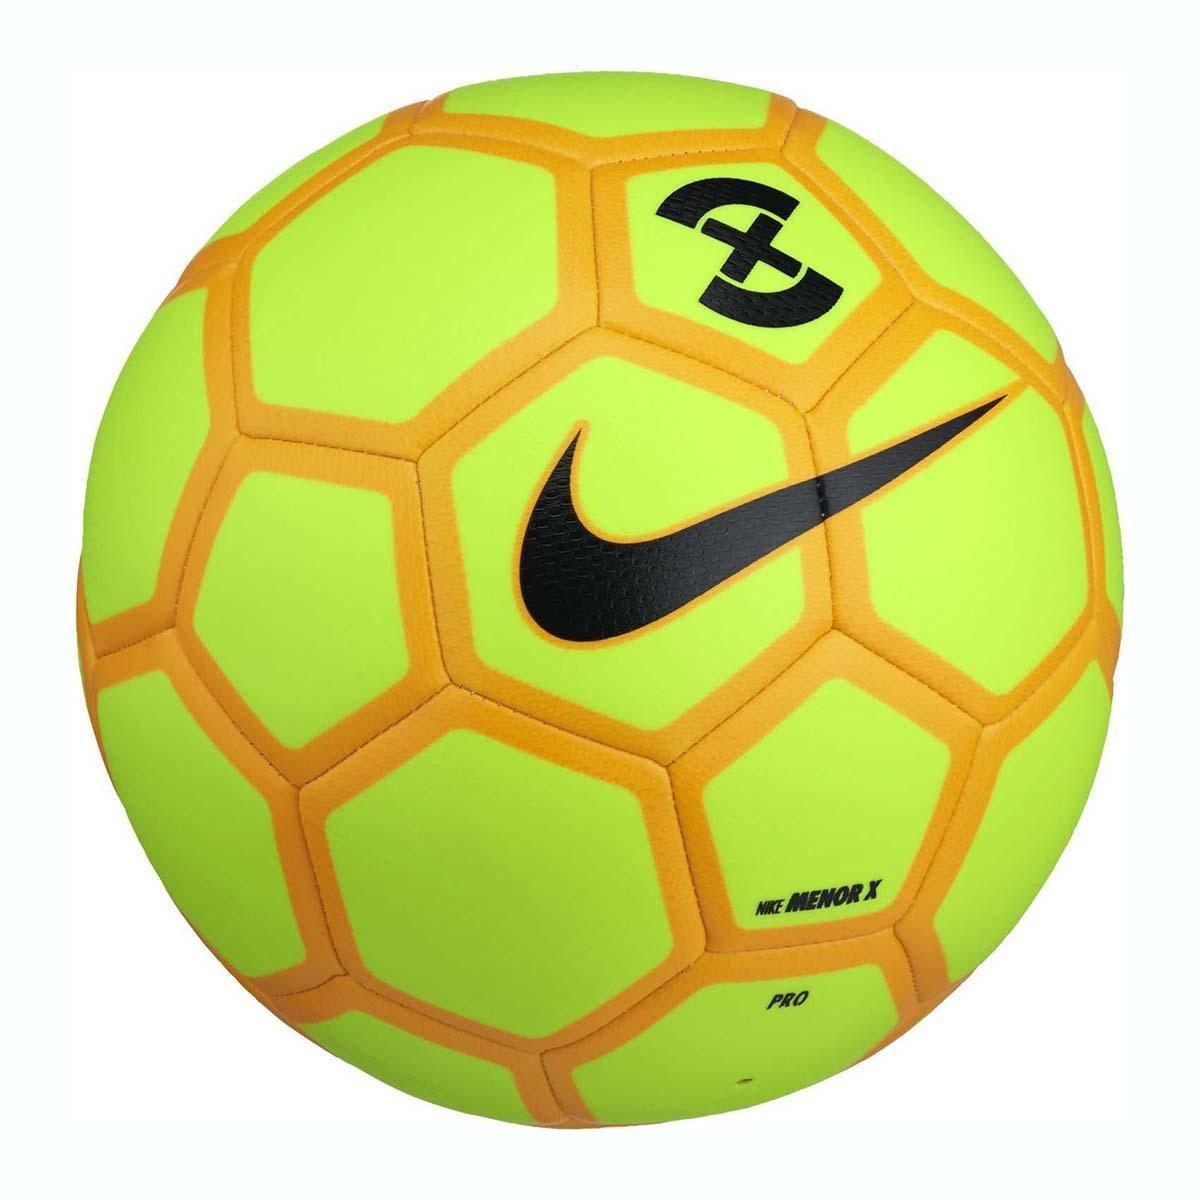 Nike NK minore X Pallone, Unisex adulto, Unisex adulto, NK MENOR X, verde/arancione/nero (volt/laser